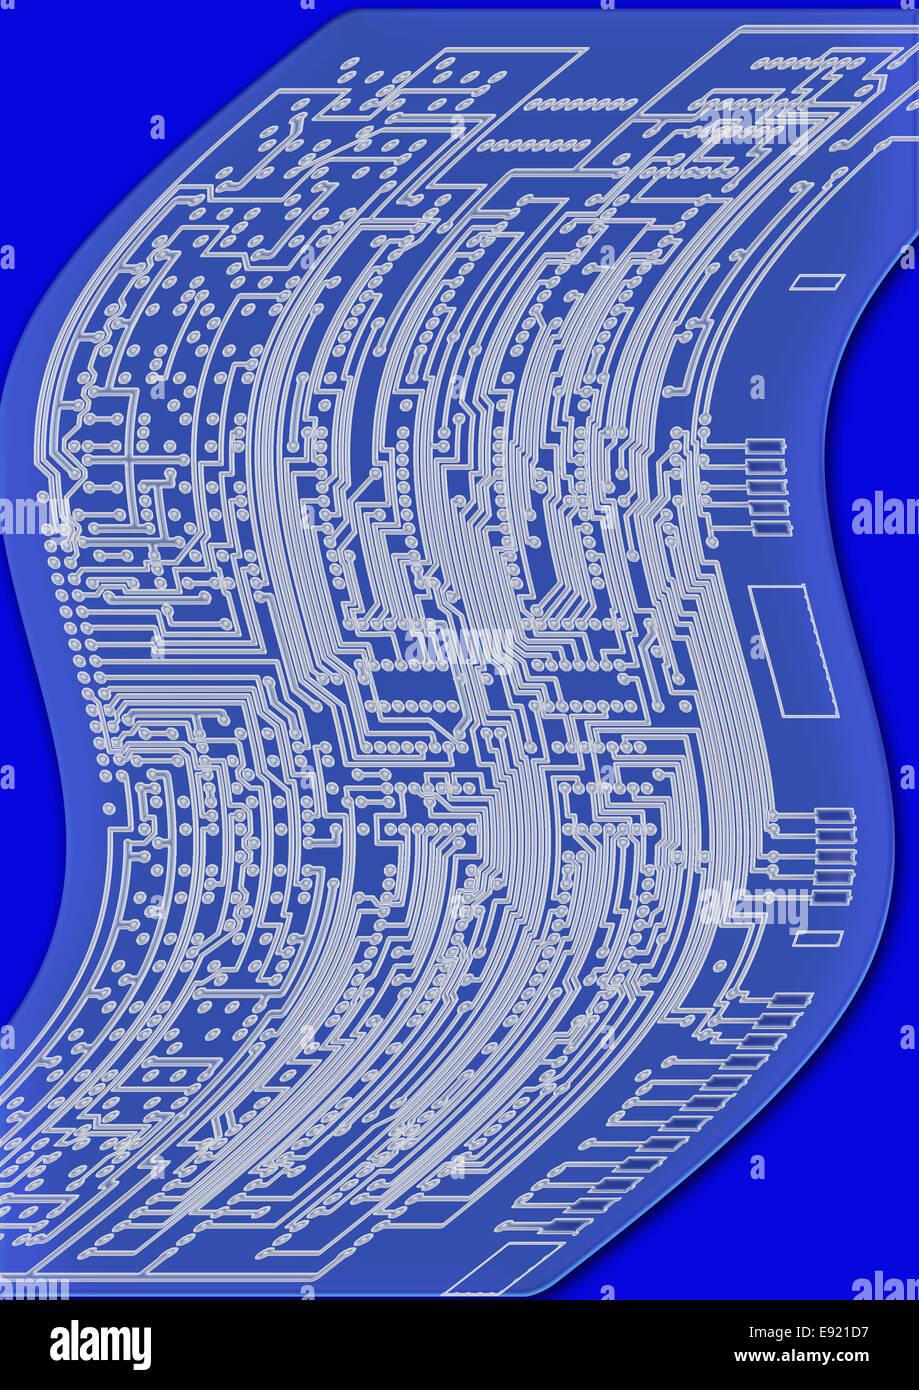 blueprint circuit board Stock Photo: 74418435 - Alamy